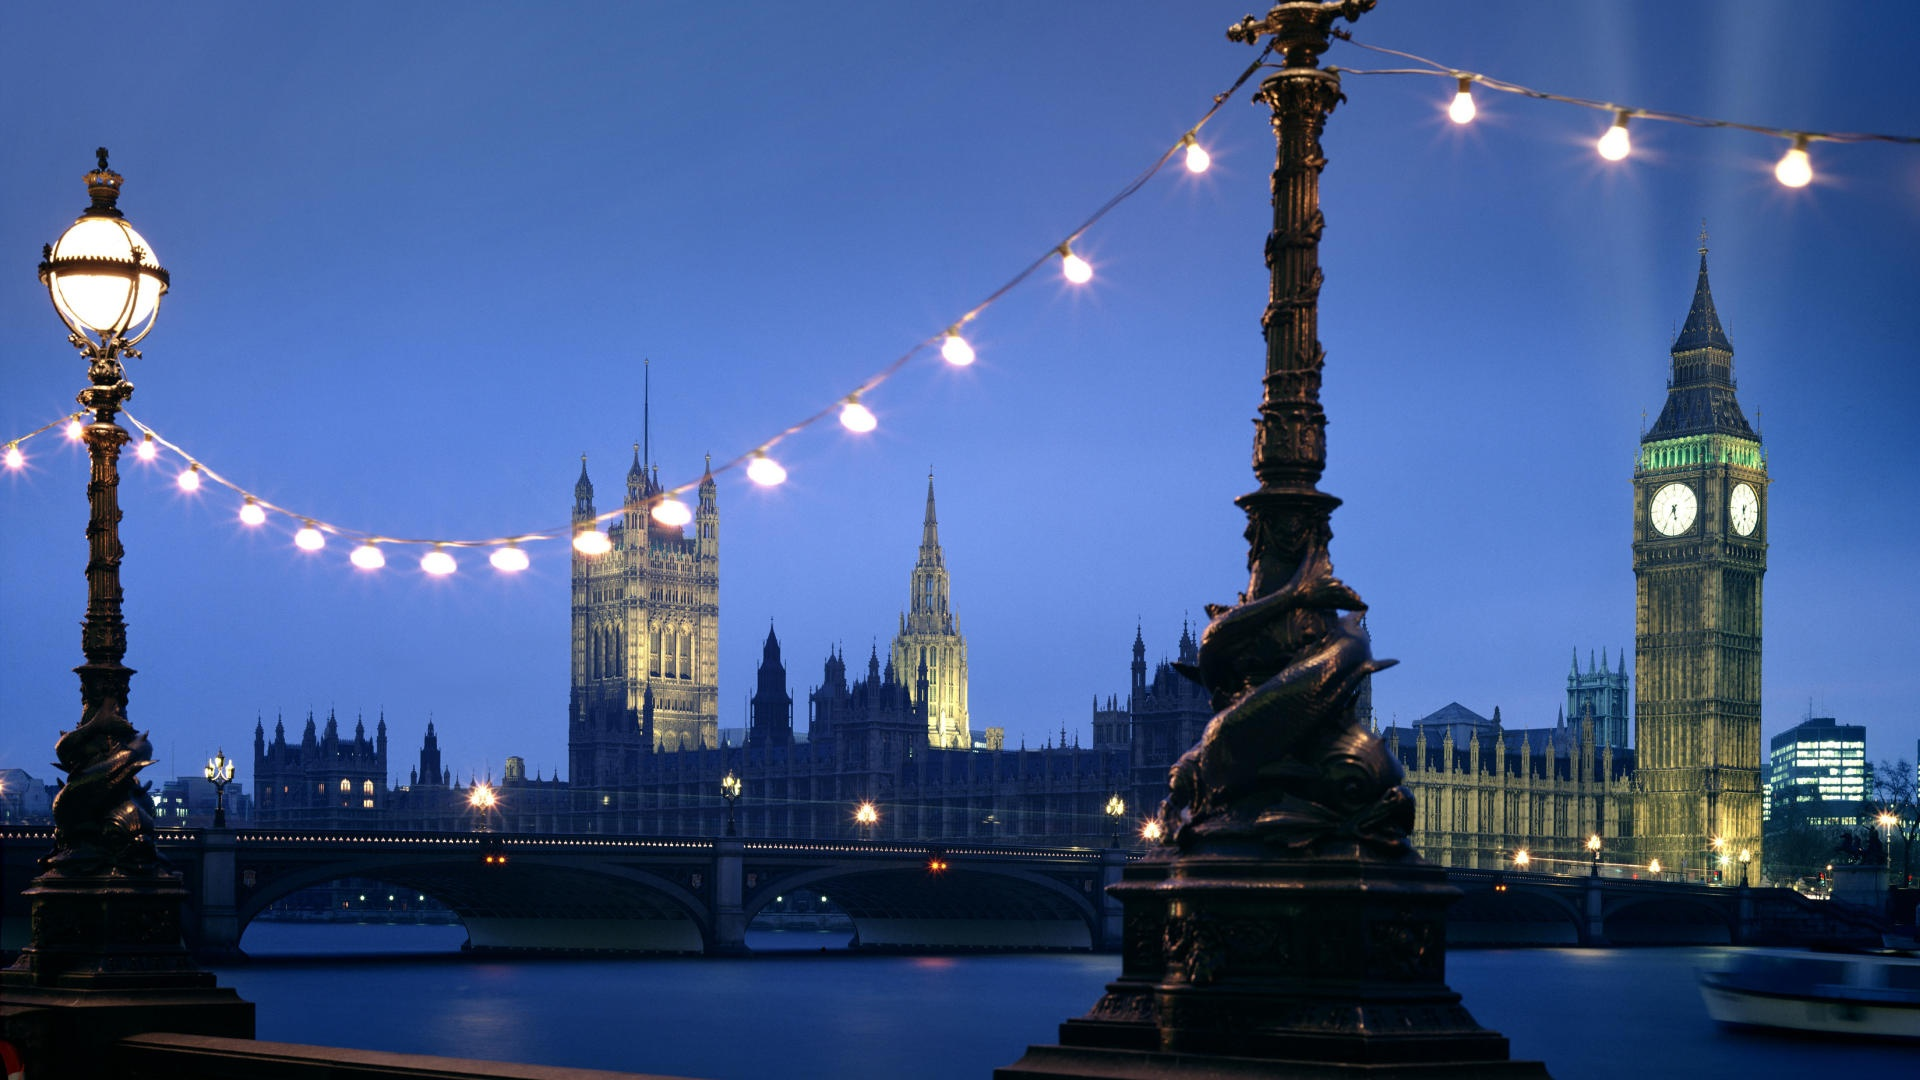 Westminster London   1920x1080   169 1920x1080